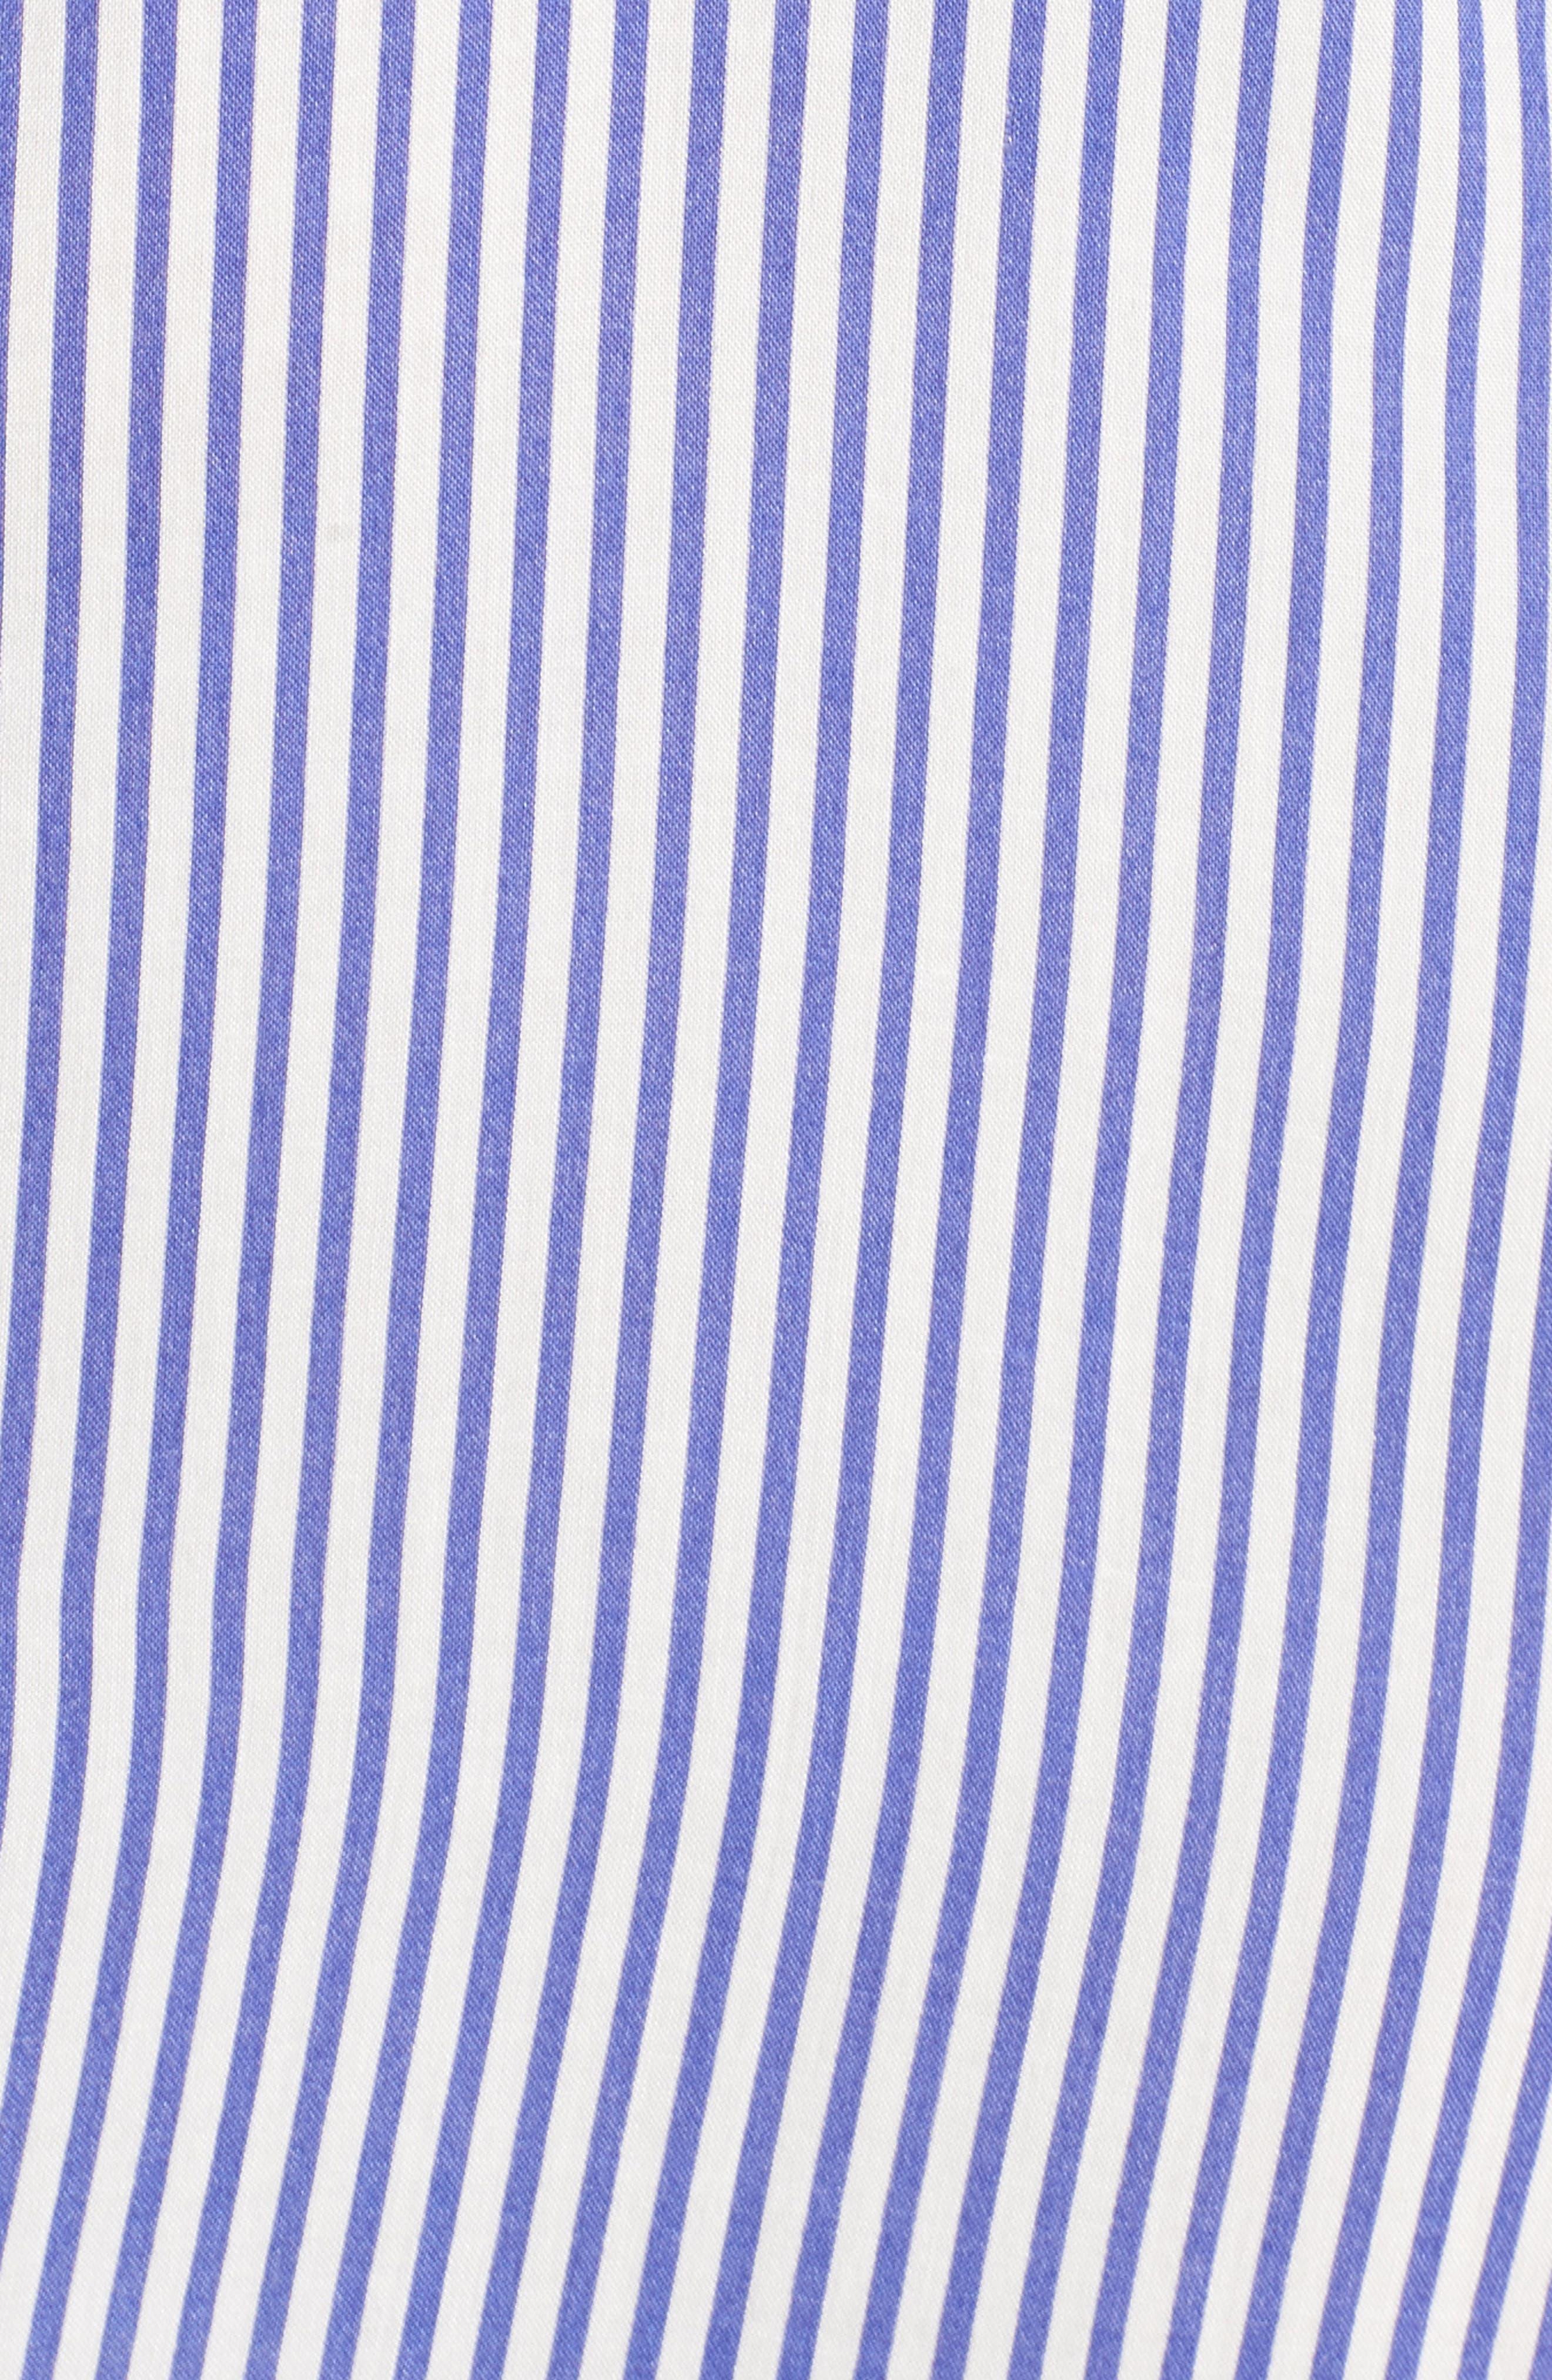 Bishop + Young Stripe Tie Waist Shirtdress,                             Alternate thumbnail 5, color,                             400